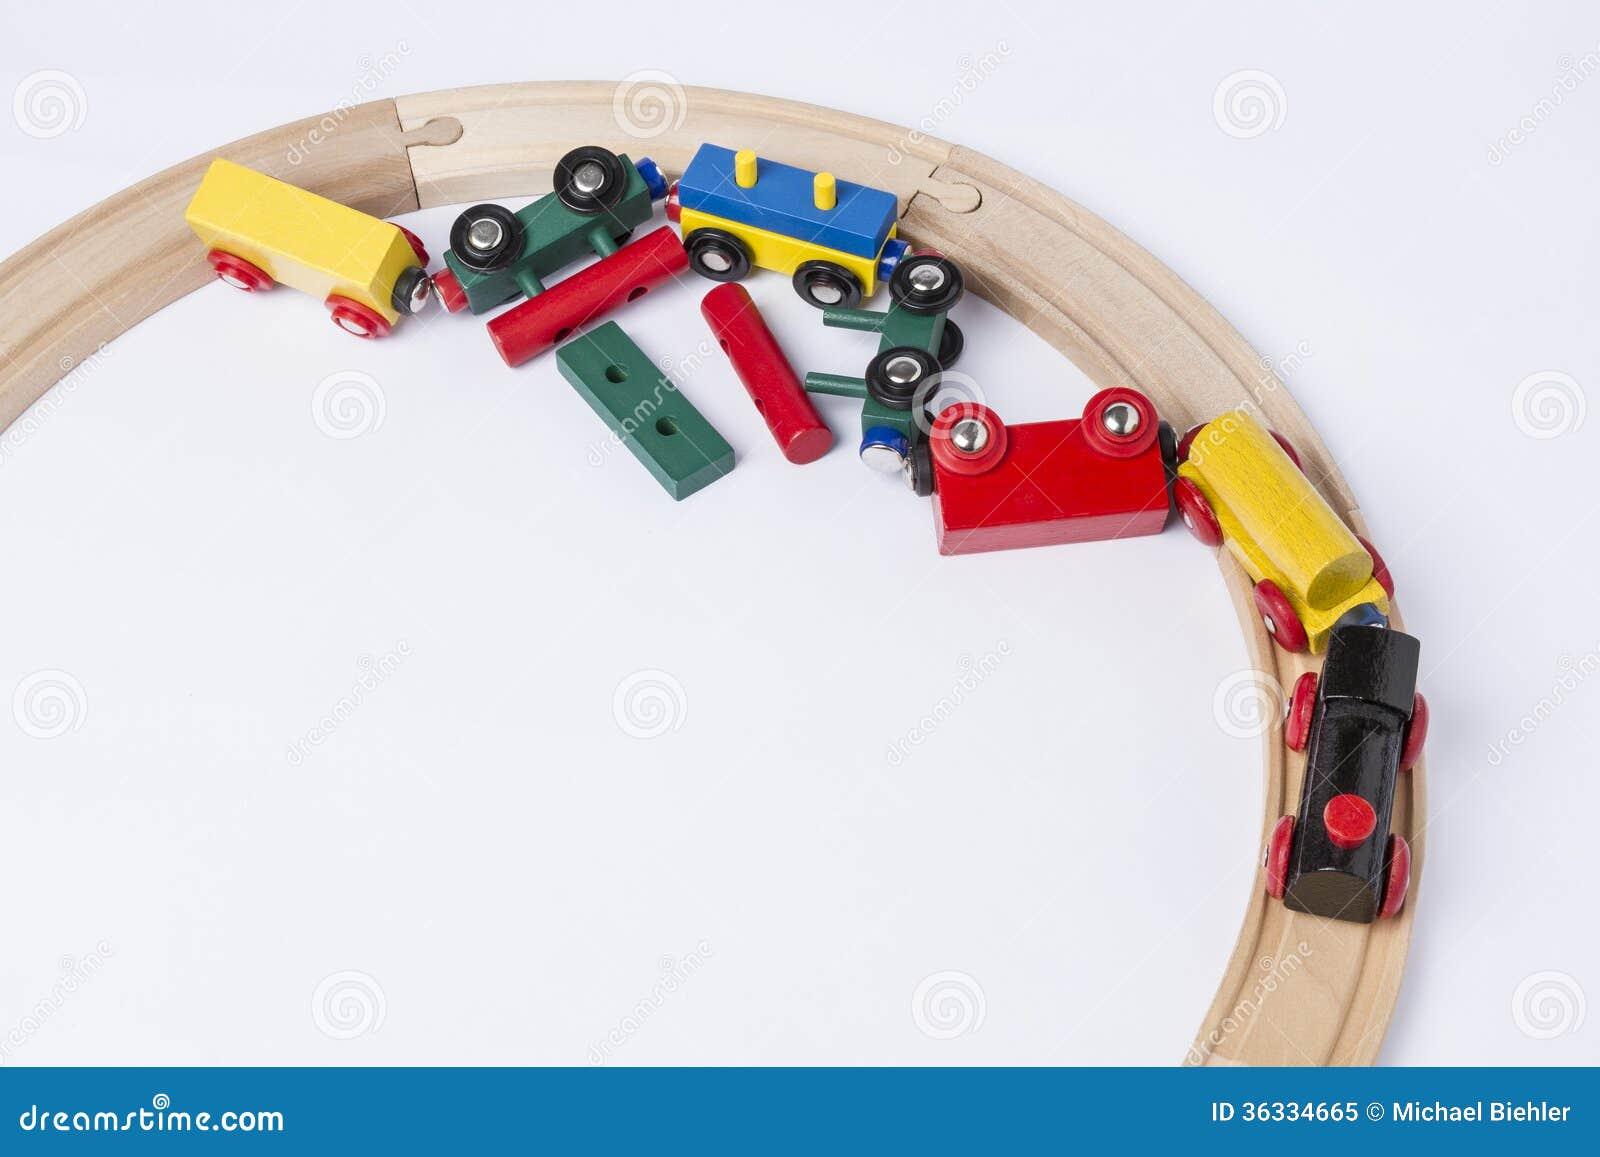 Crashed Wooden Toy Train Royalty Free Stock Photo - Image: 36334665